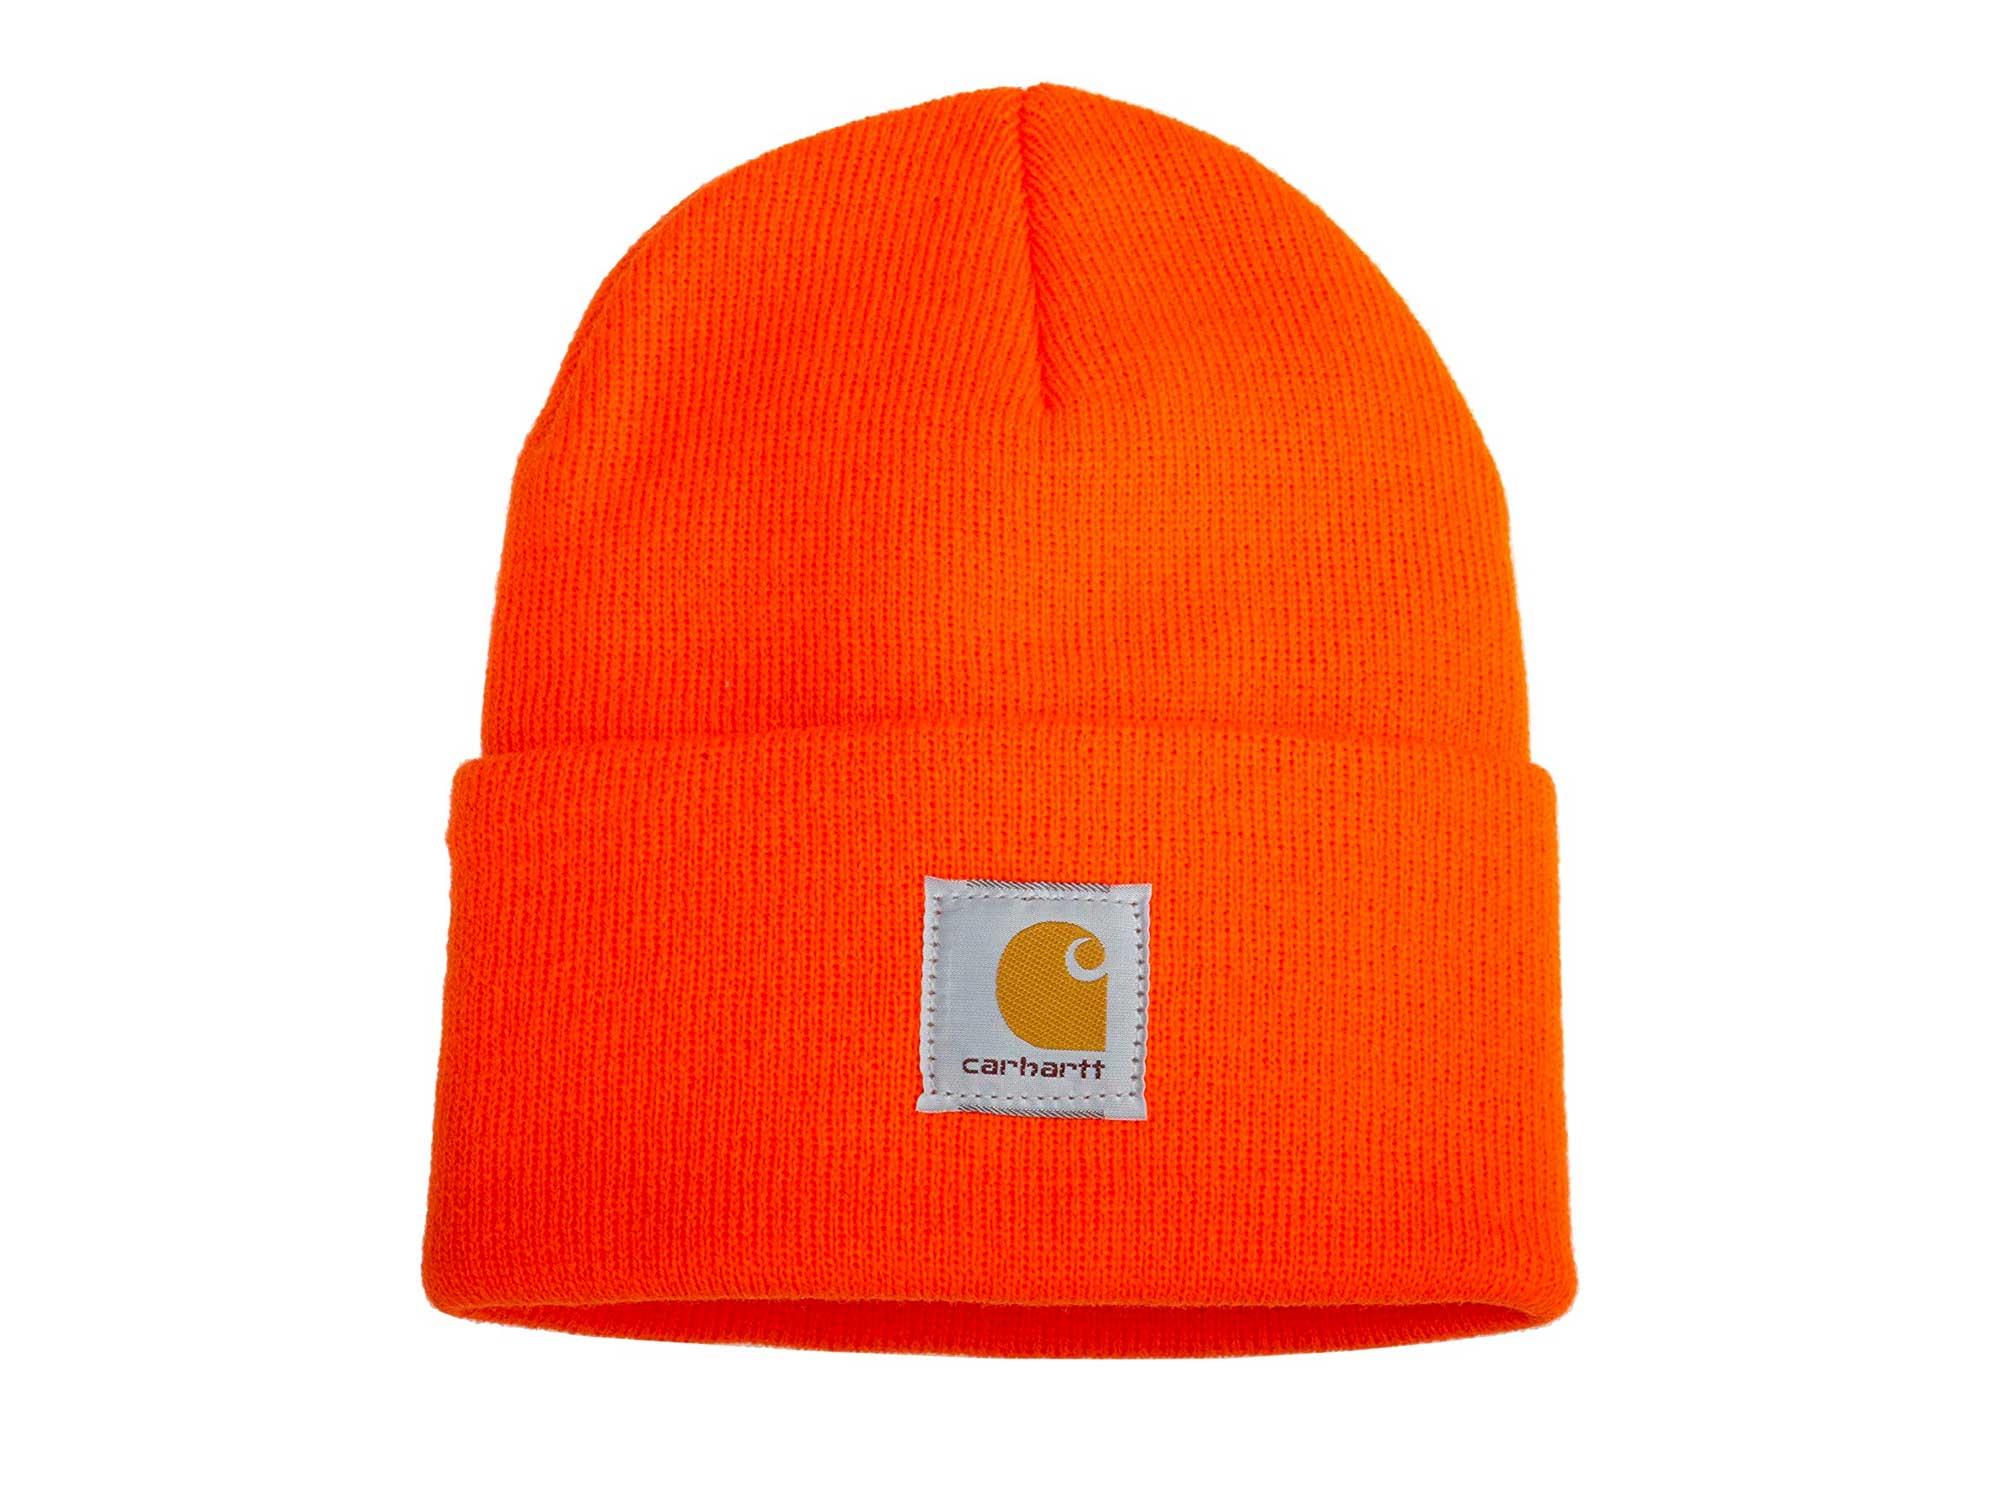 Carhartt orange hunting hat